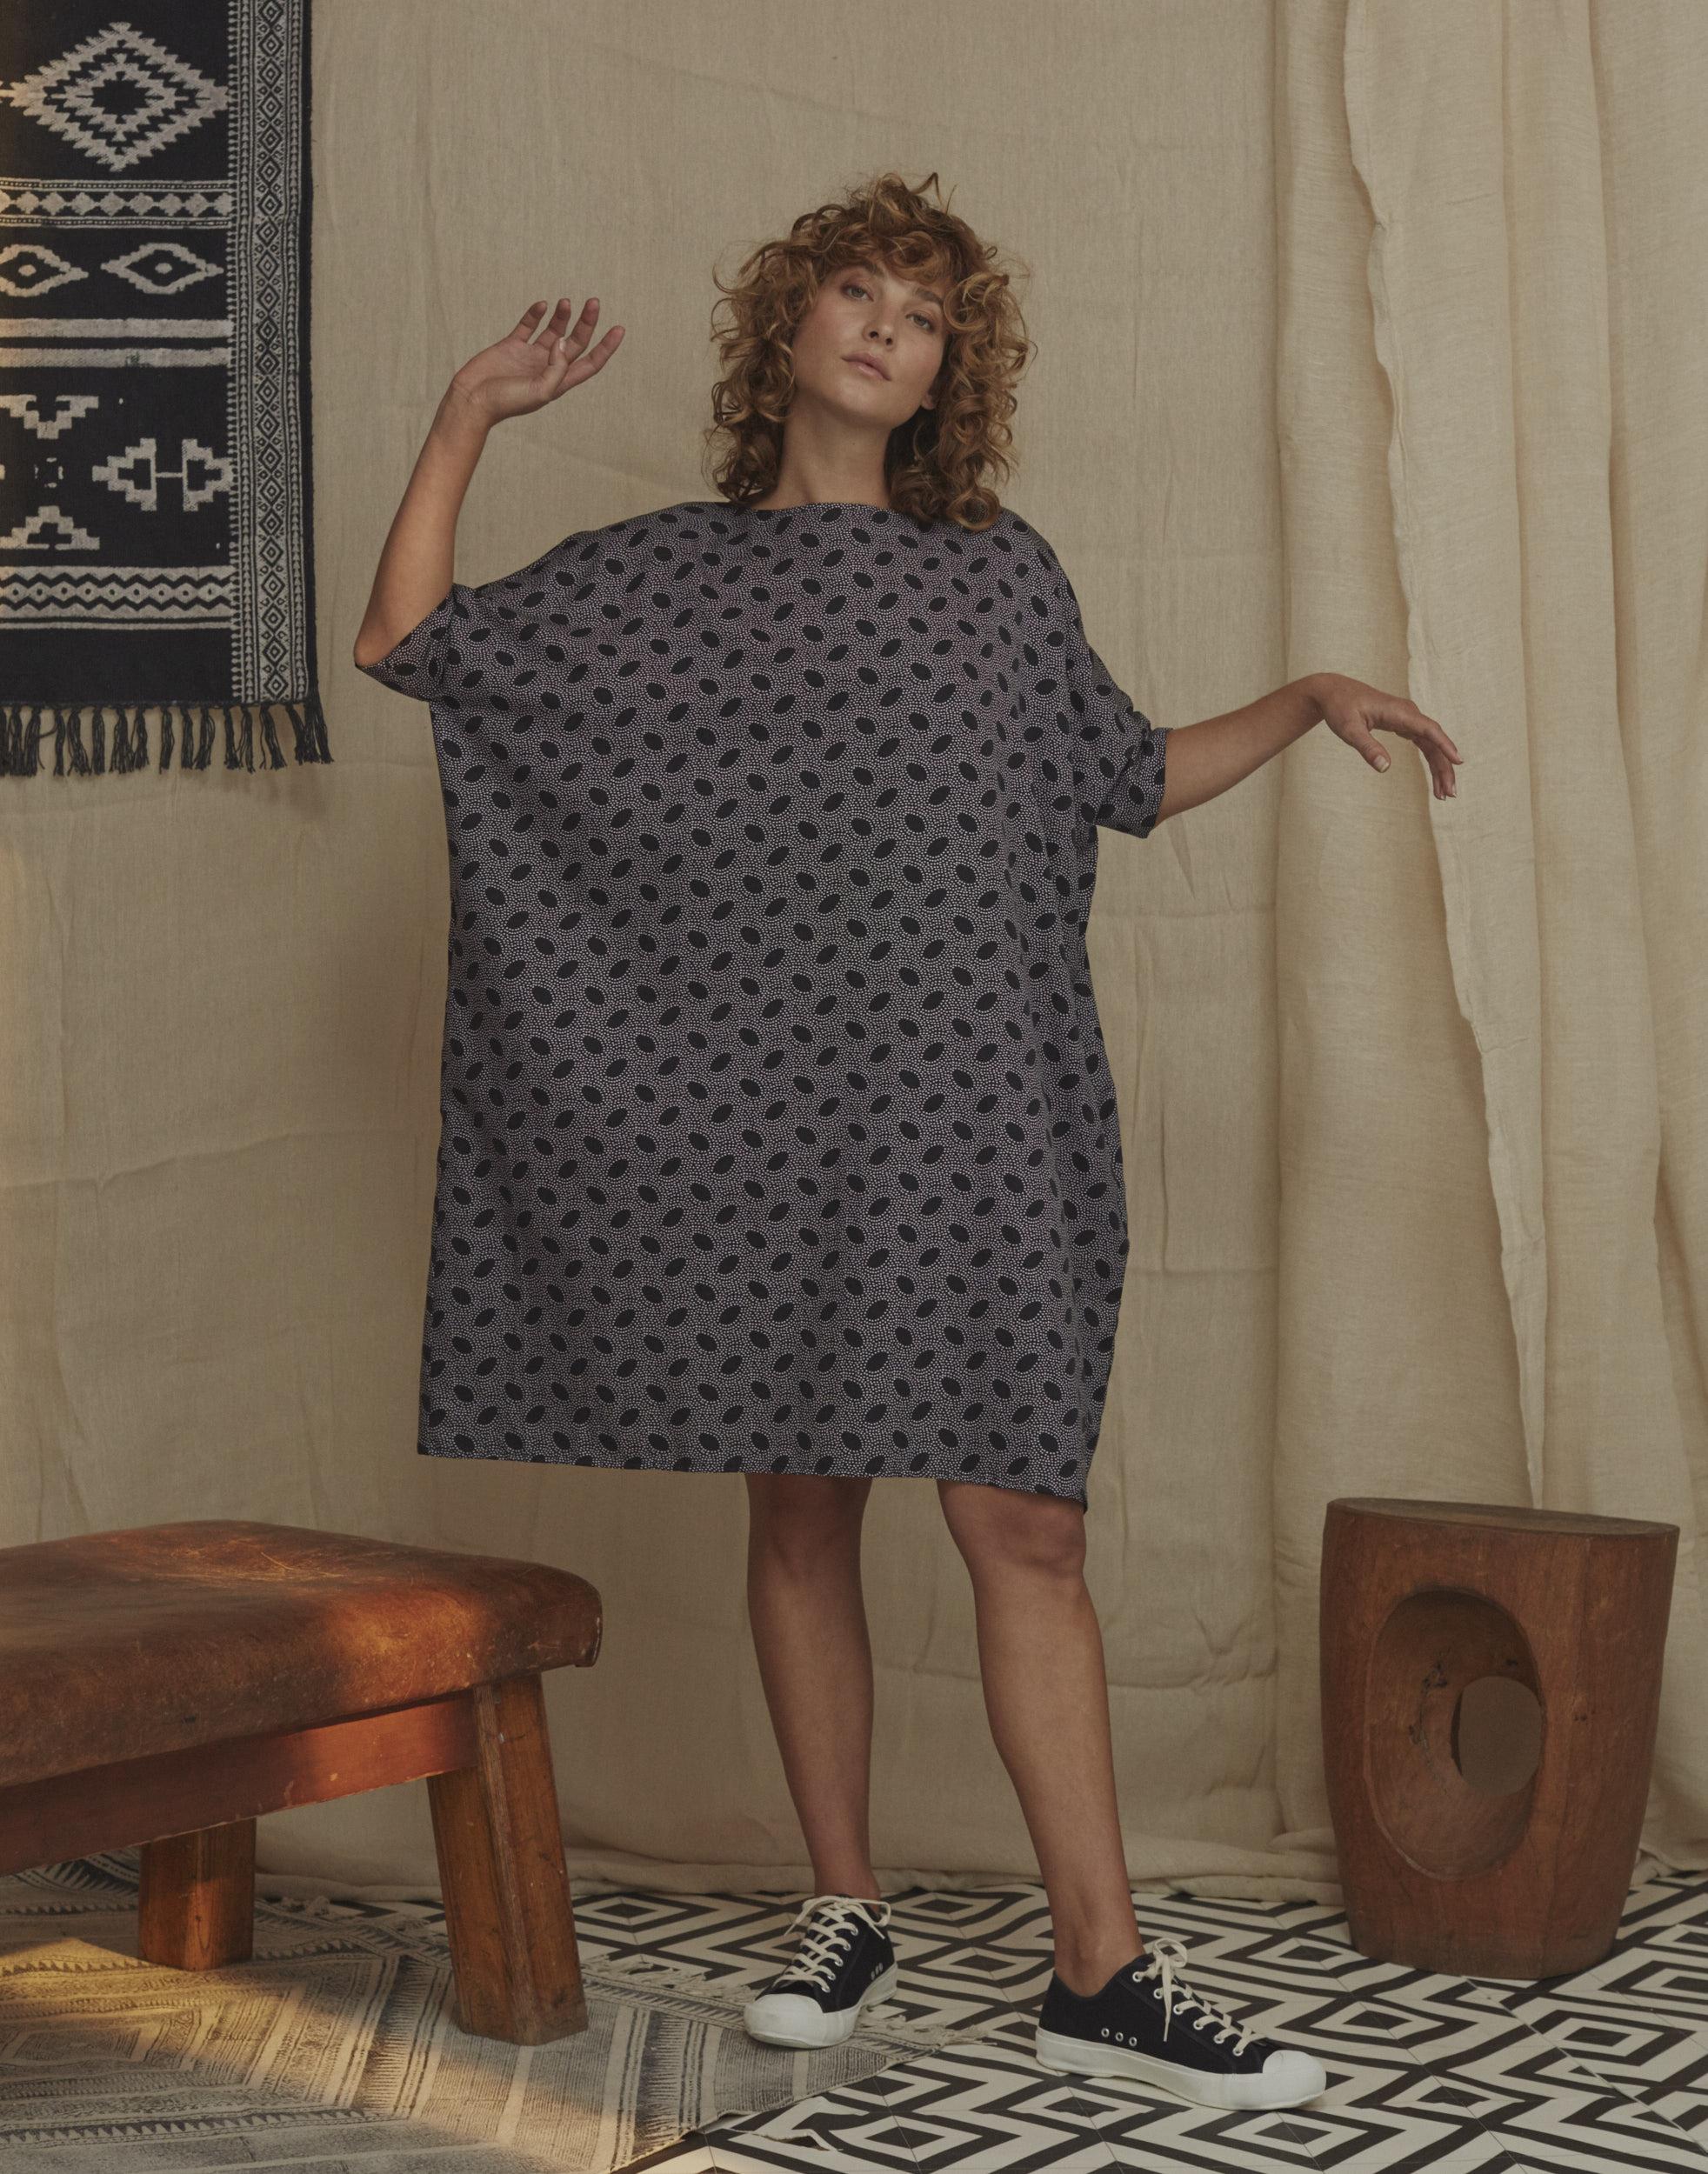 ymc-ss17-collection-okoro-women-fashion-folkr-6